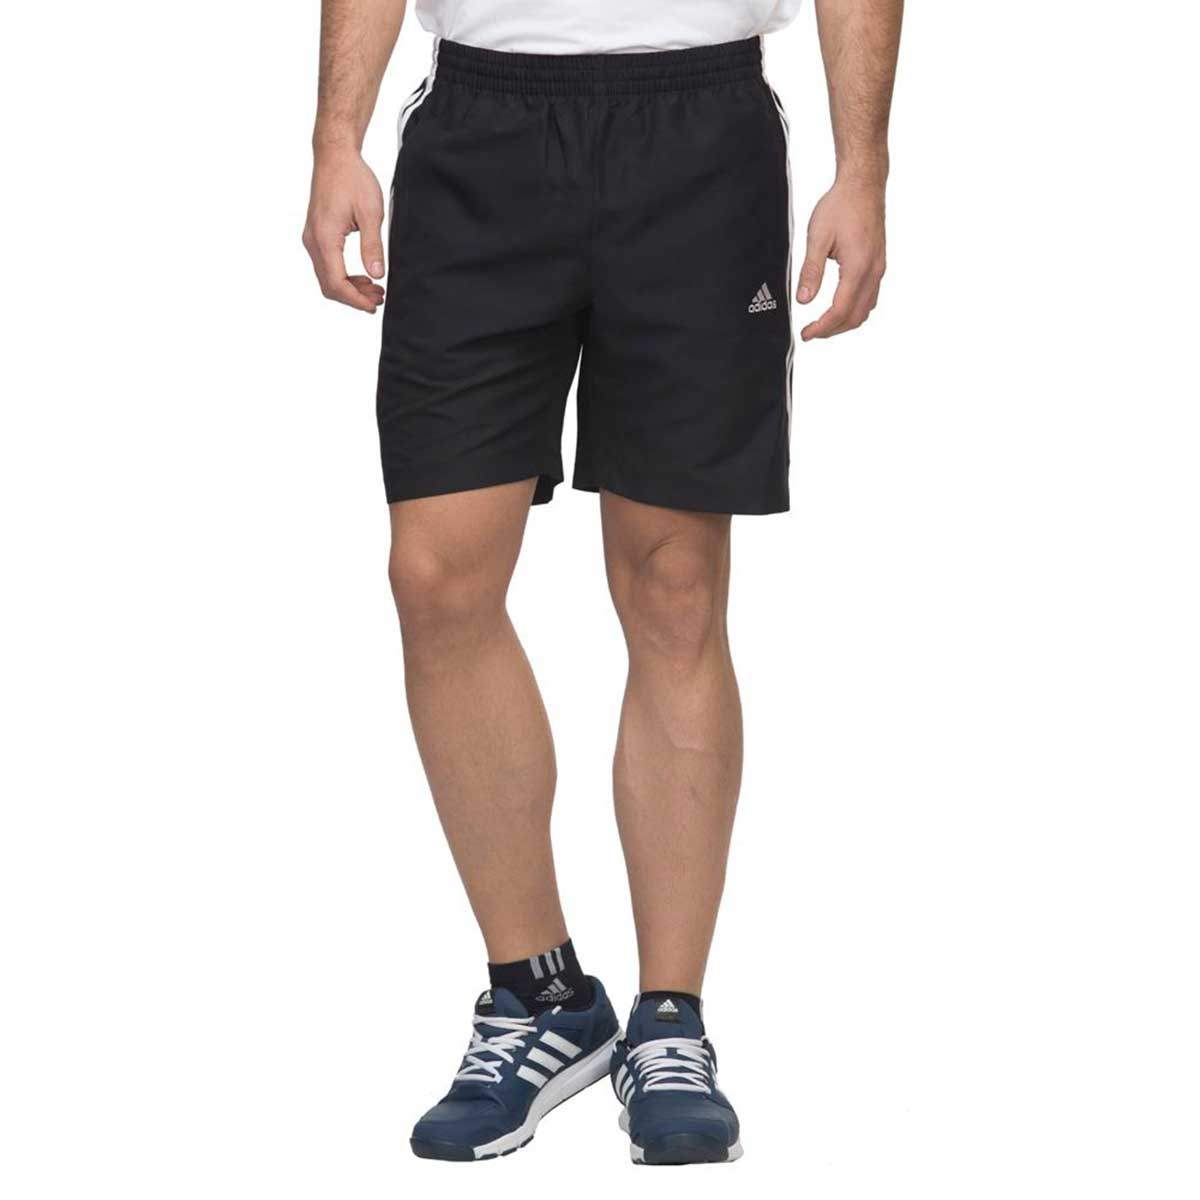 Adidas Mens Training 3 Stripes Chelsea Short (Black)